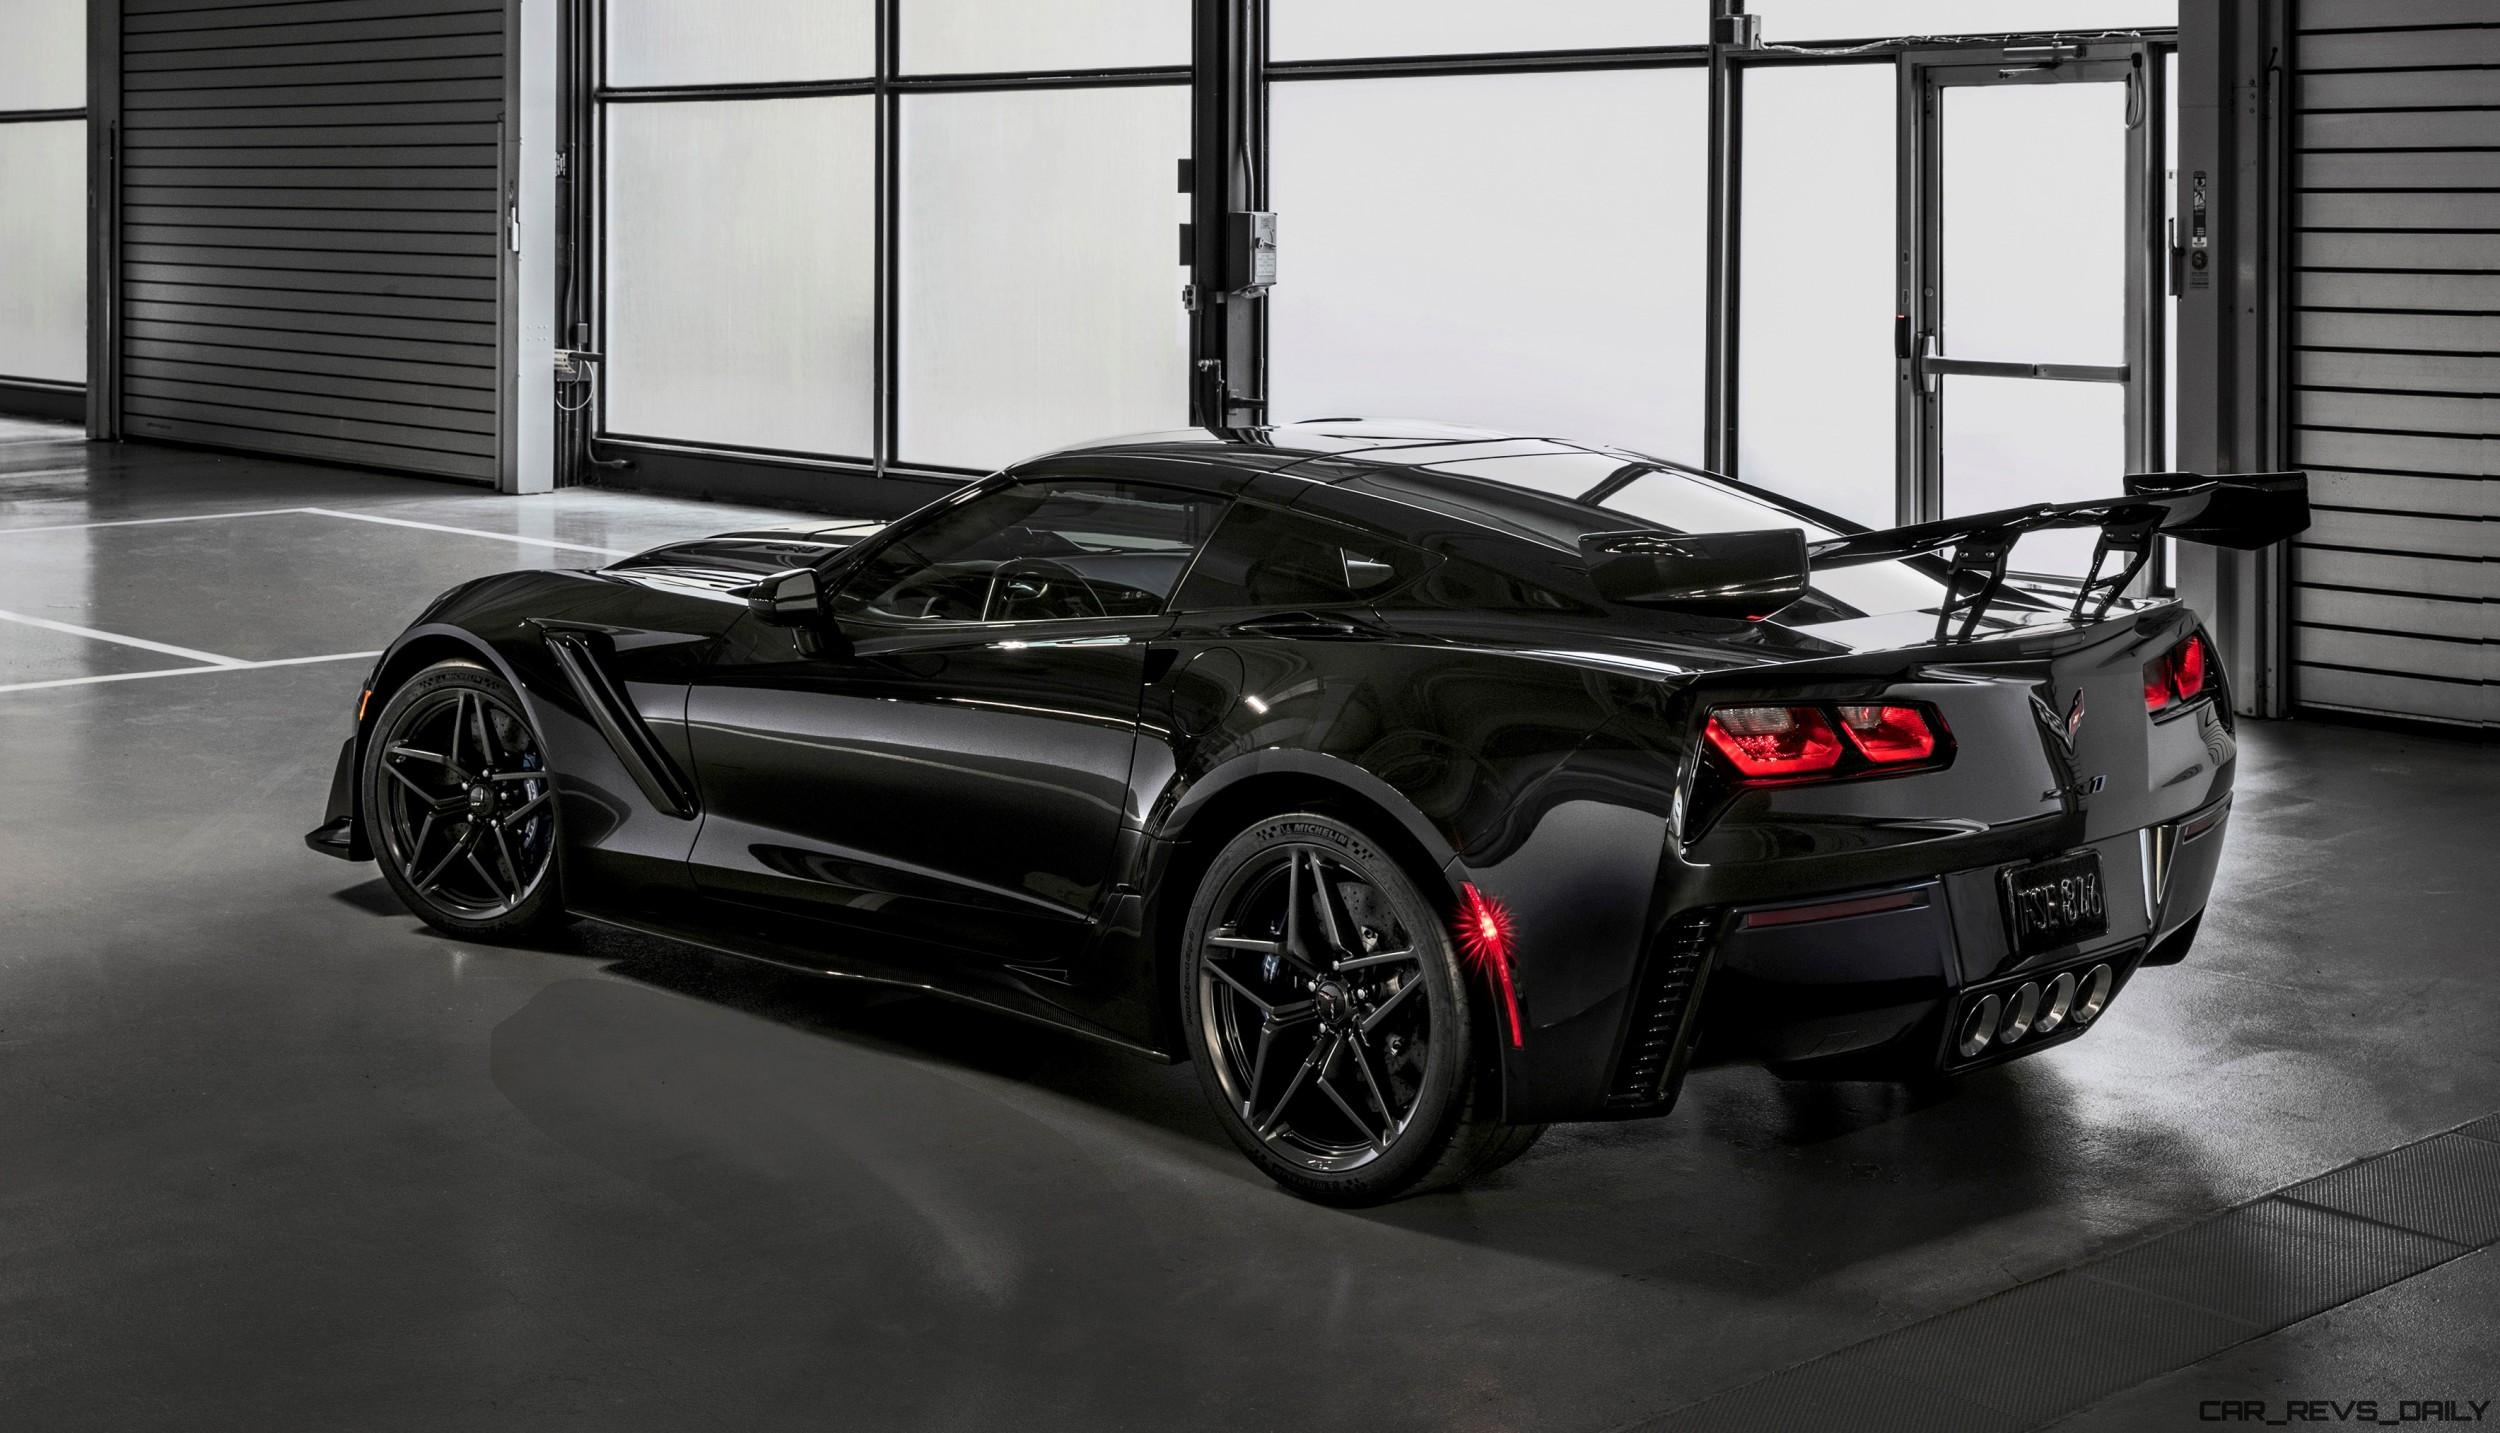 2019 chevrolet corvette zr1 013. Black Bedroom Furniture Sets. Home Design Ideas